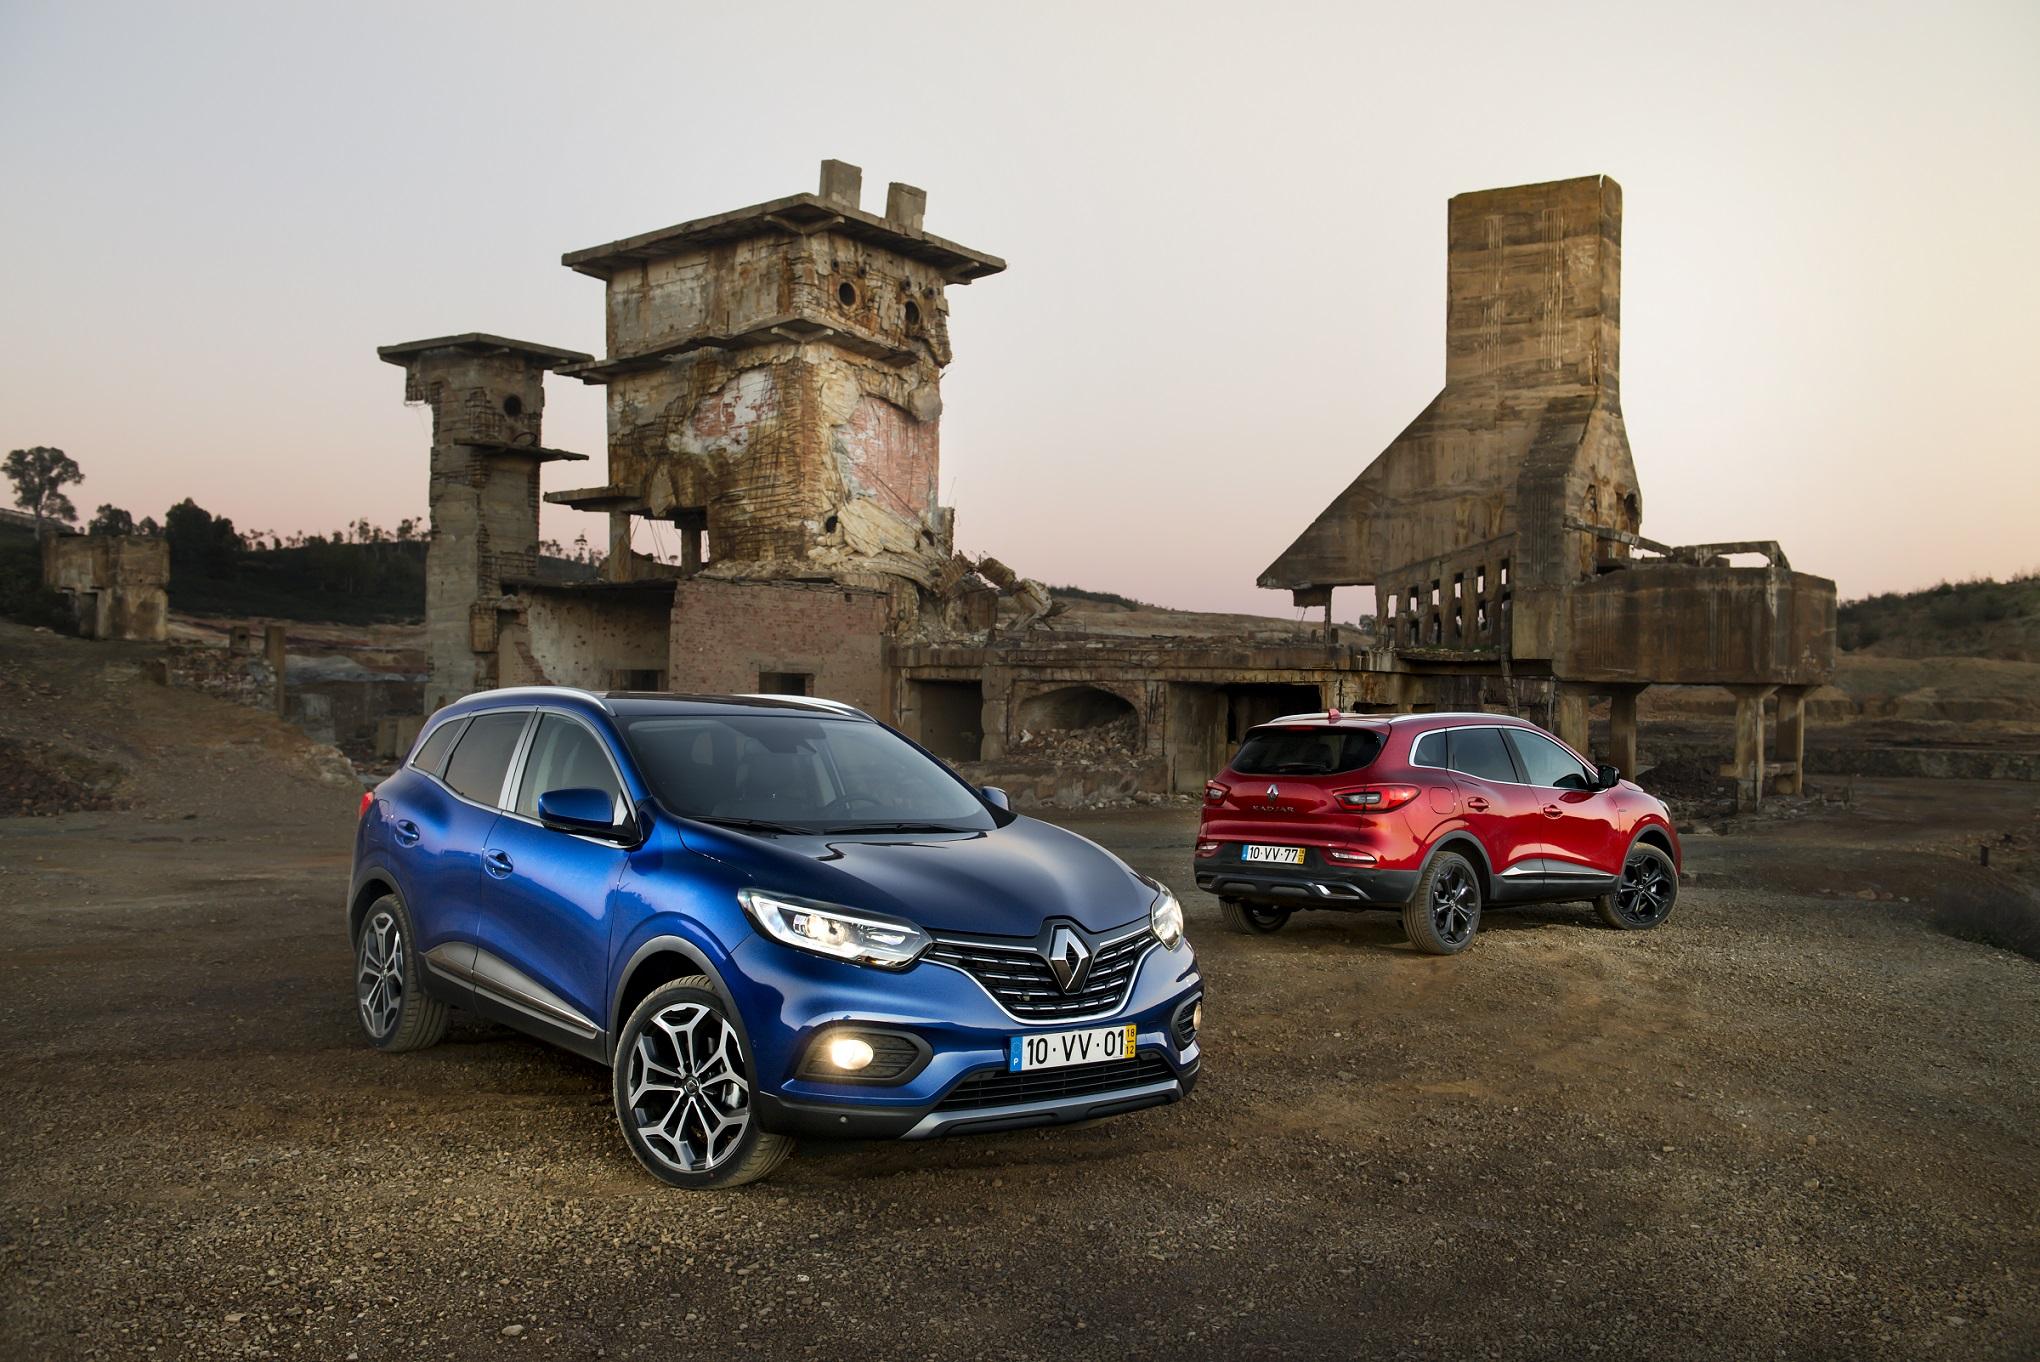 Novo motor 1.7 Blue dCi já disponível na gama Renault